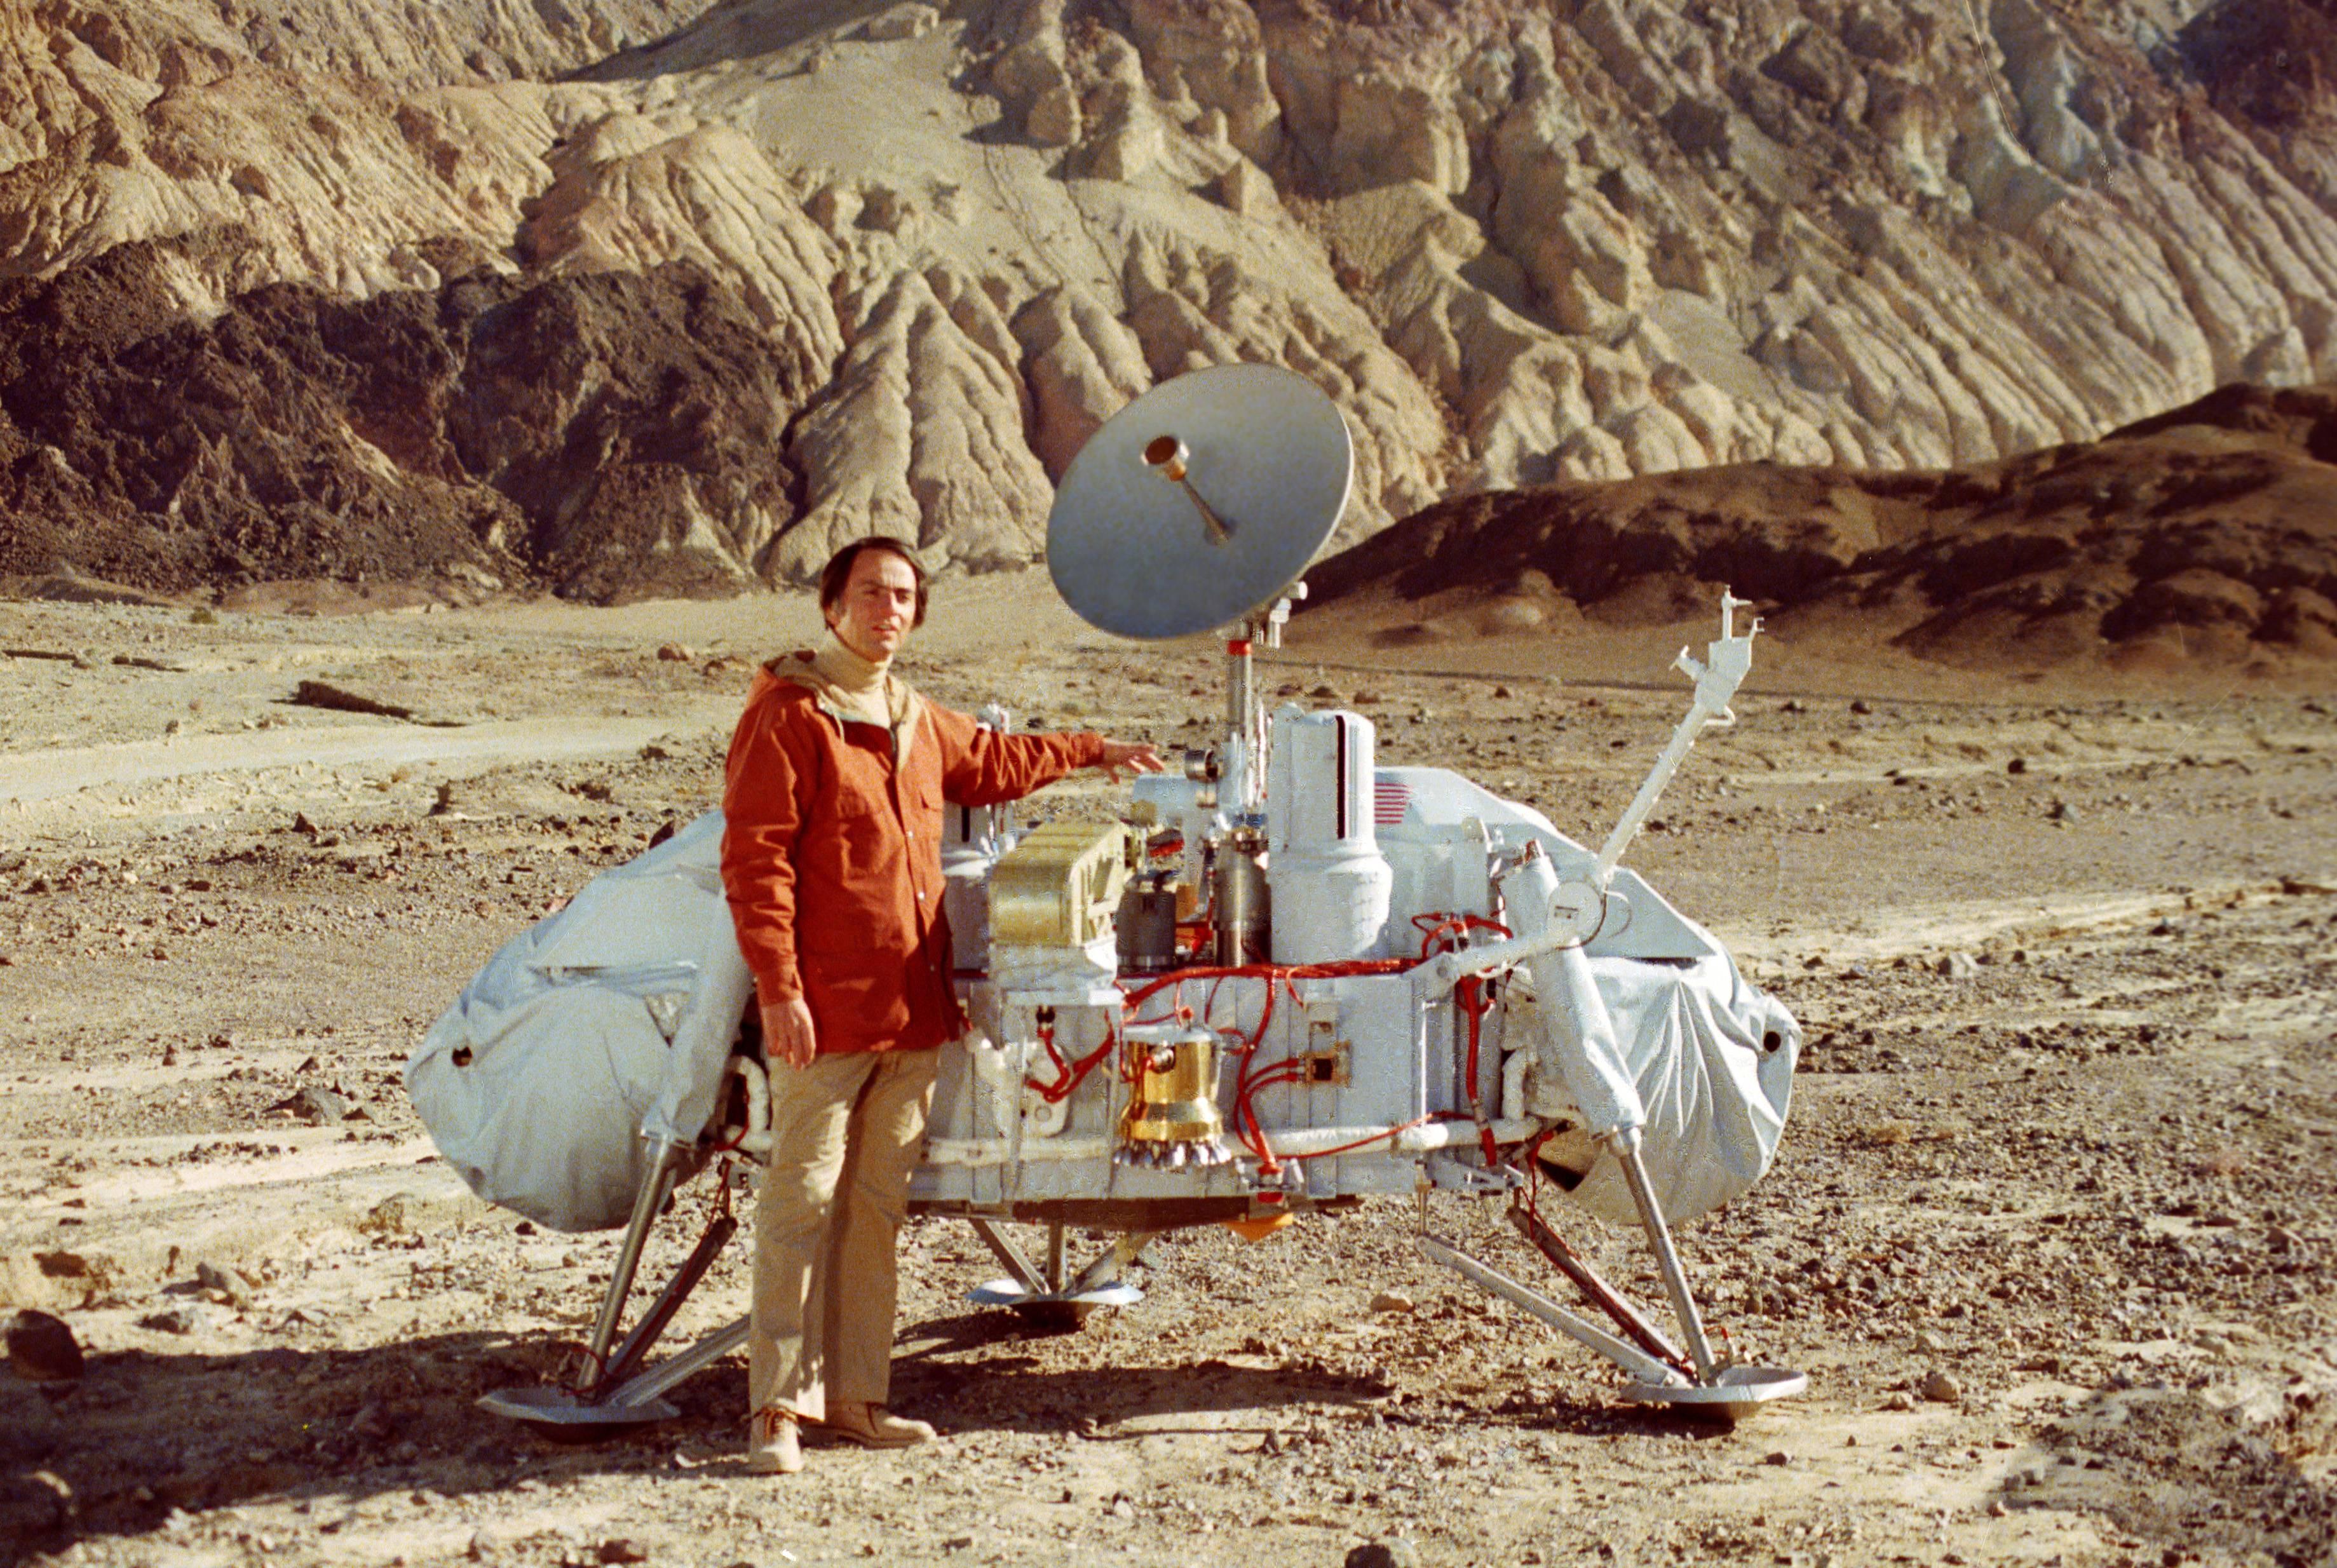 The Viking Mars Lander